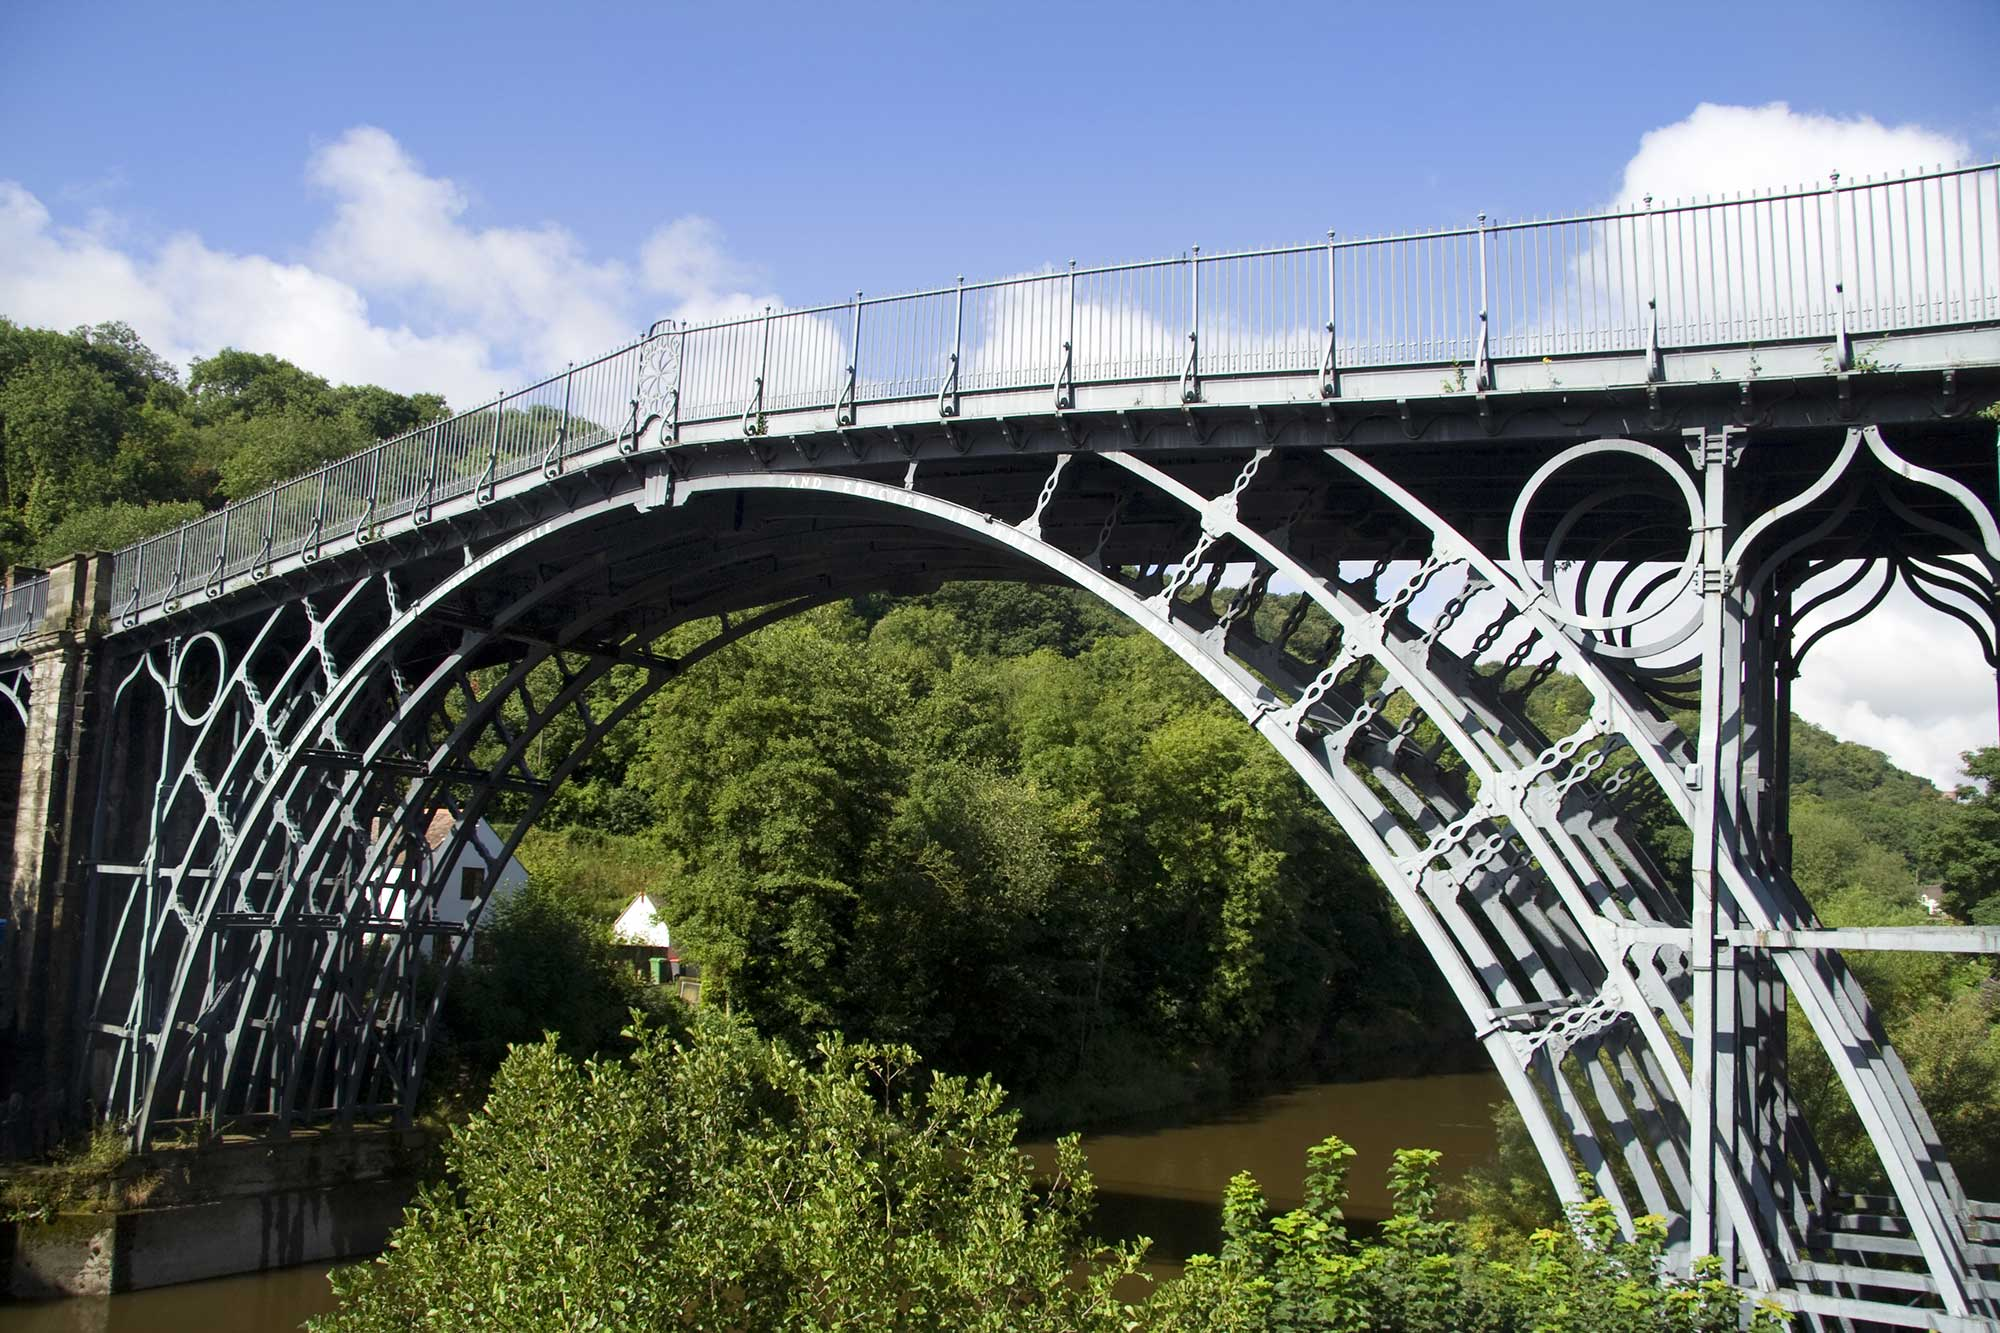 *ironbridge and gorge